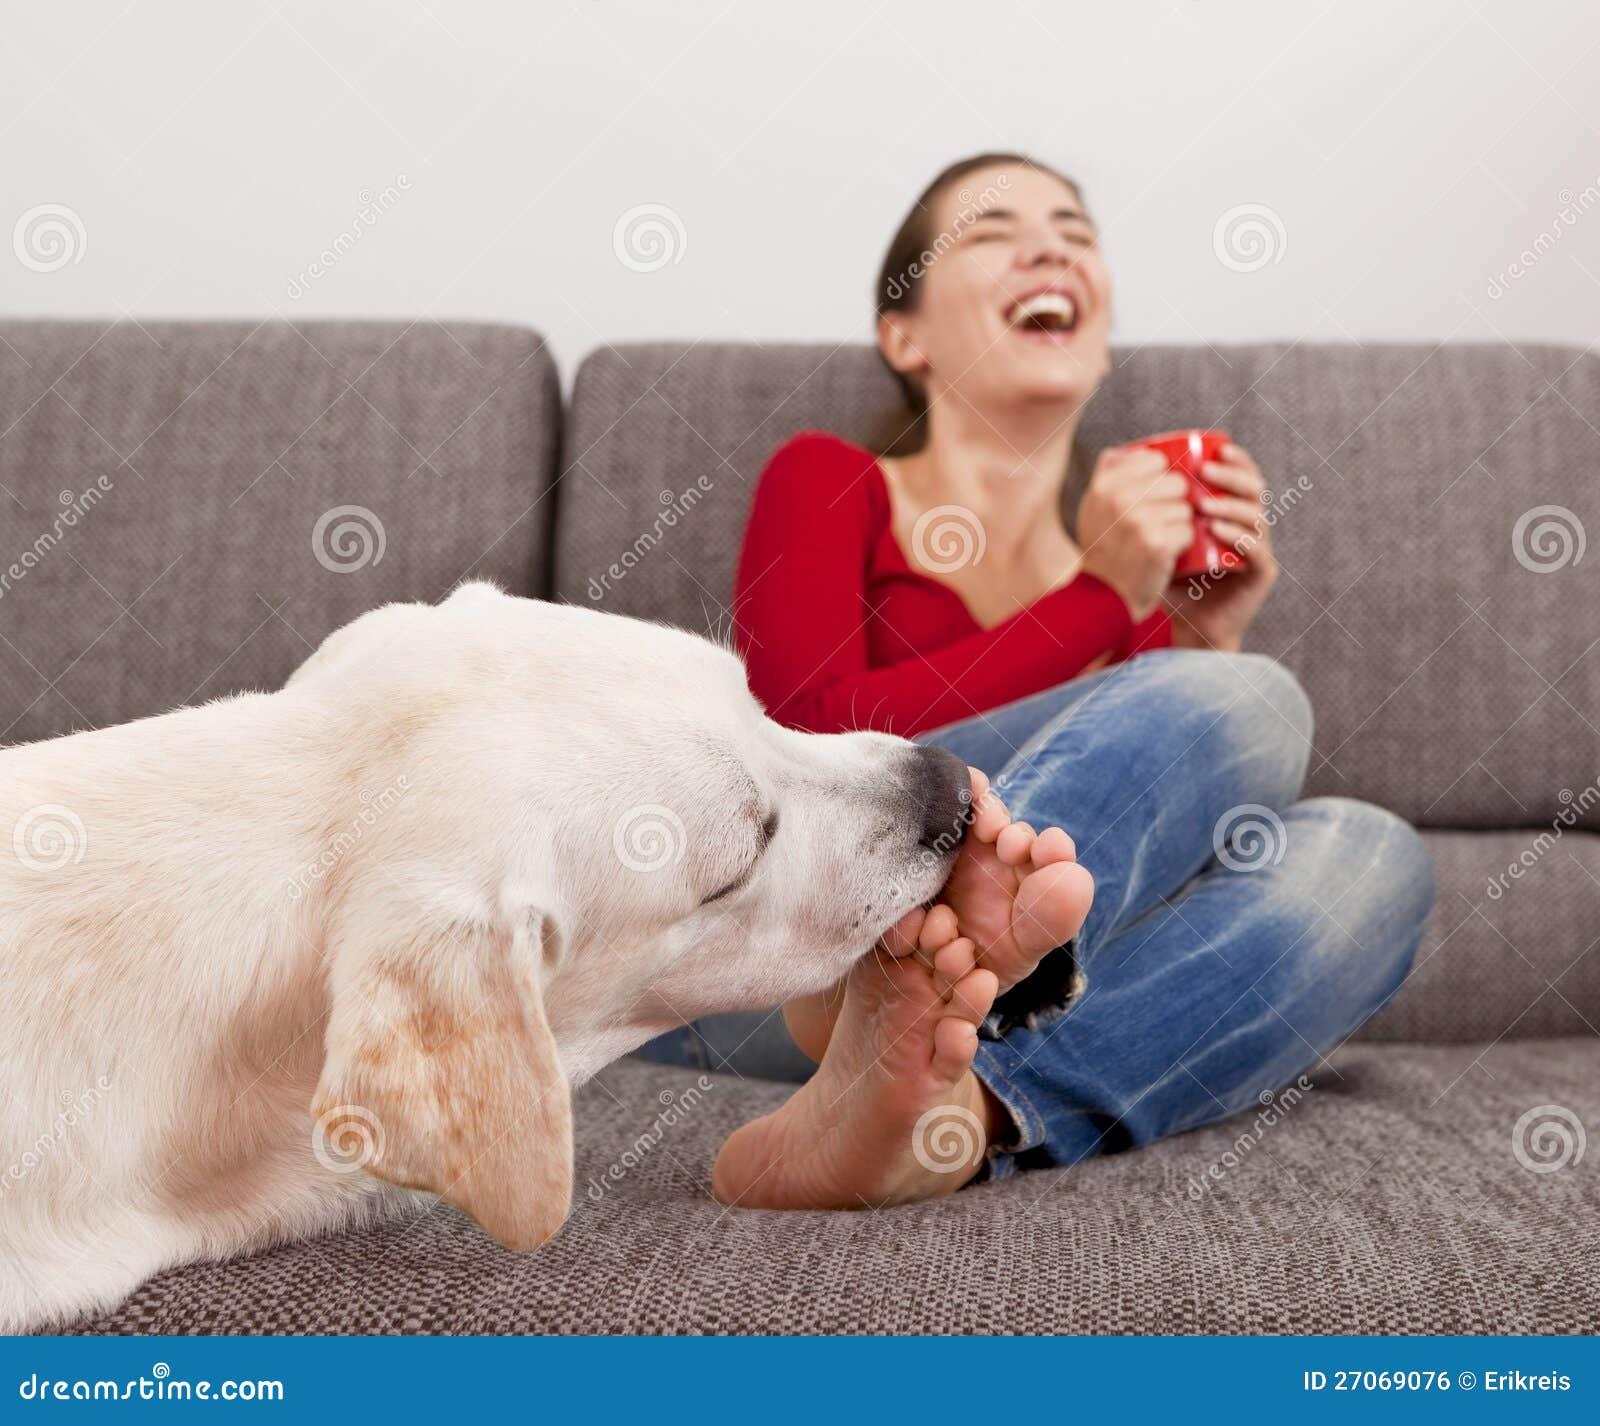 Girls Lick Dogs